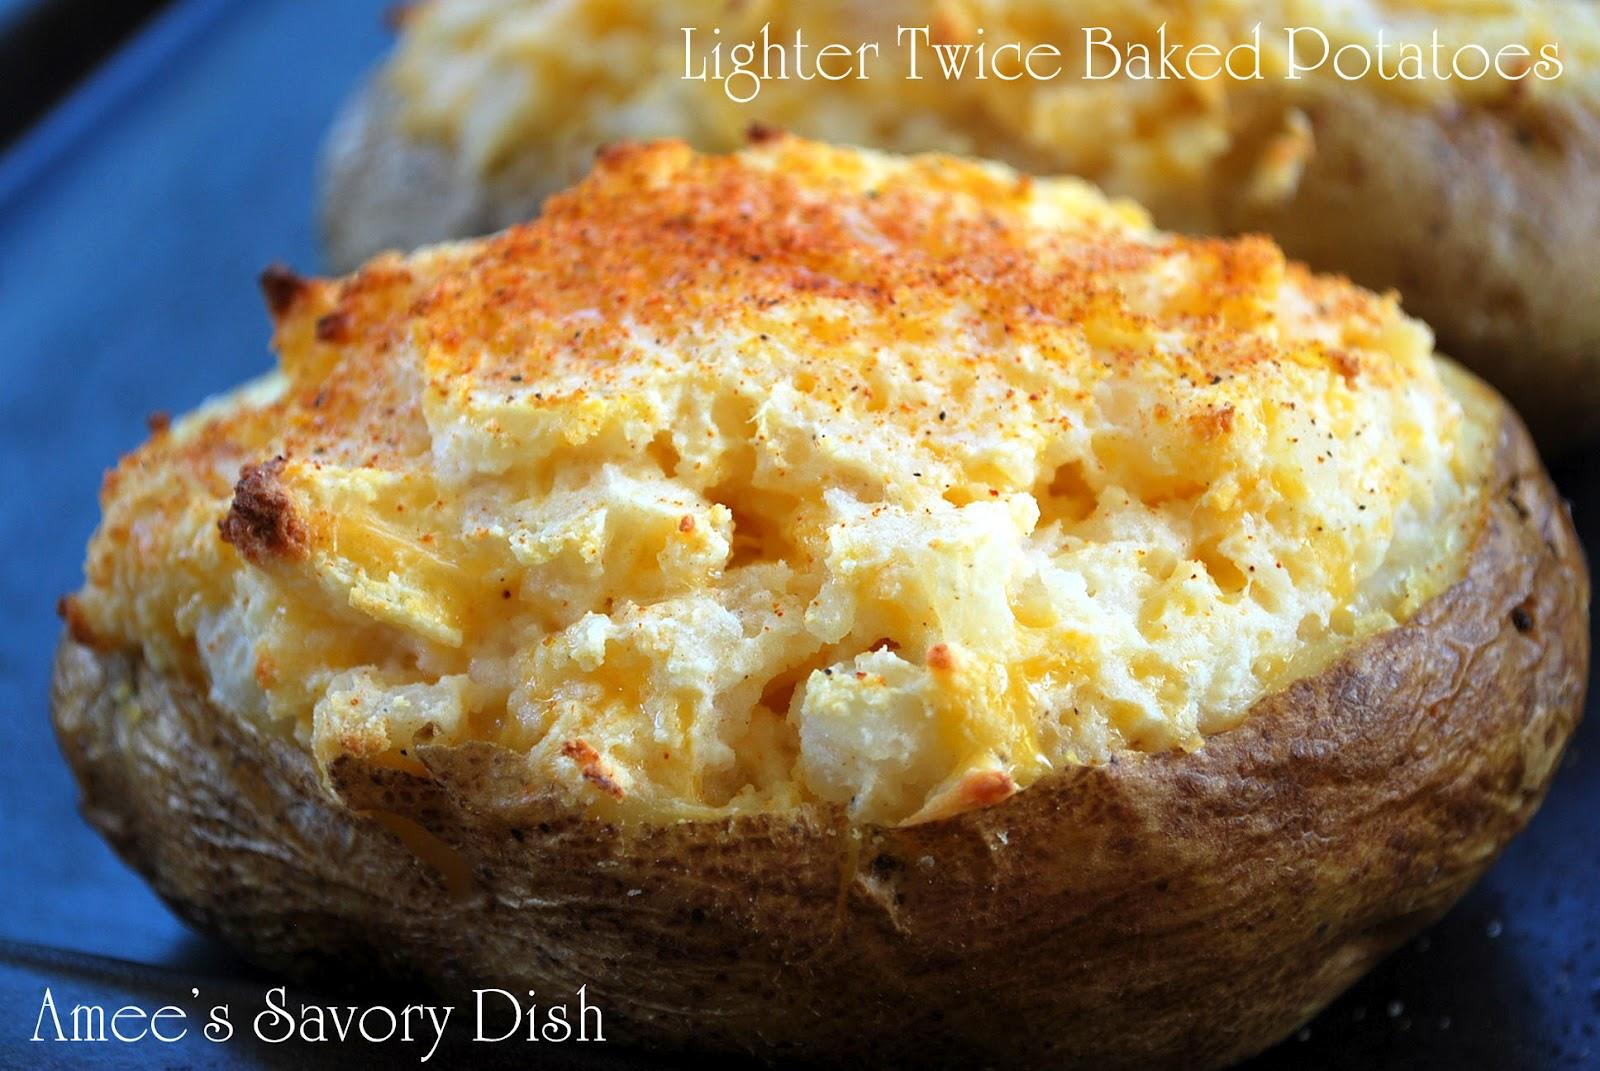 Twice Baked Potatoes Lightened-Up